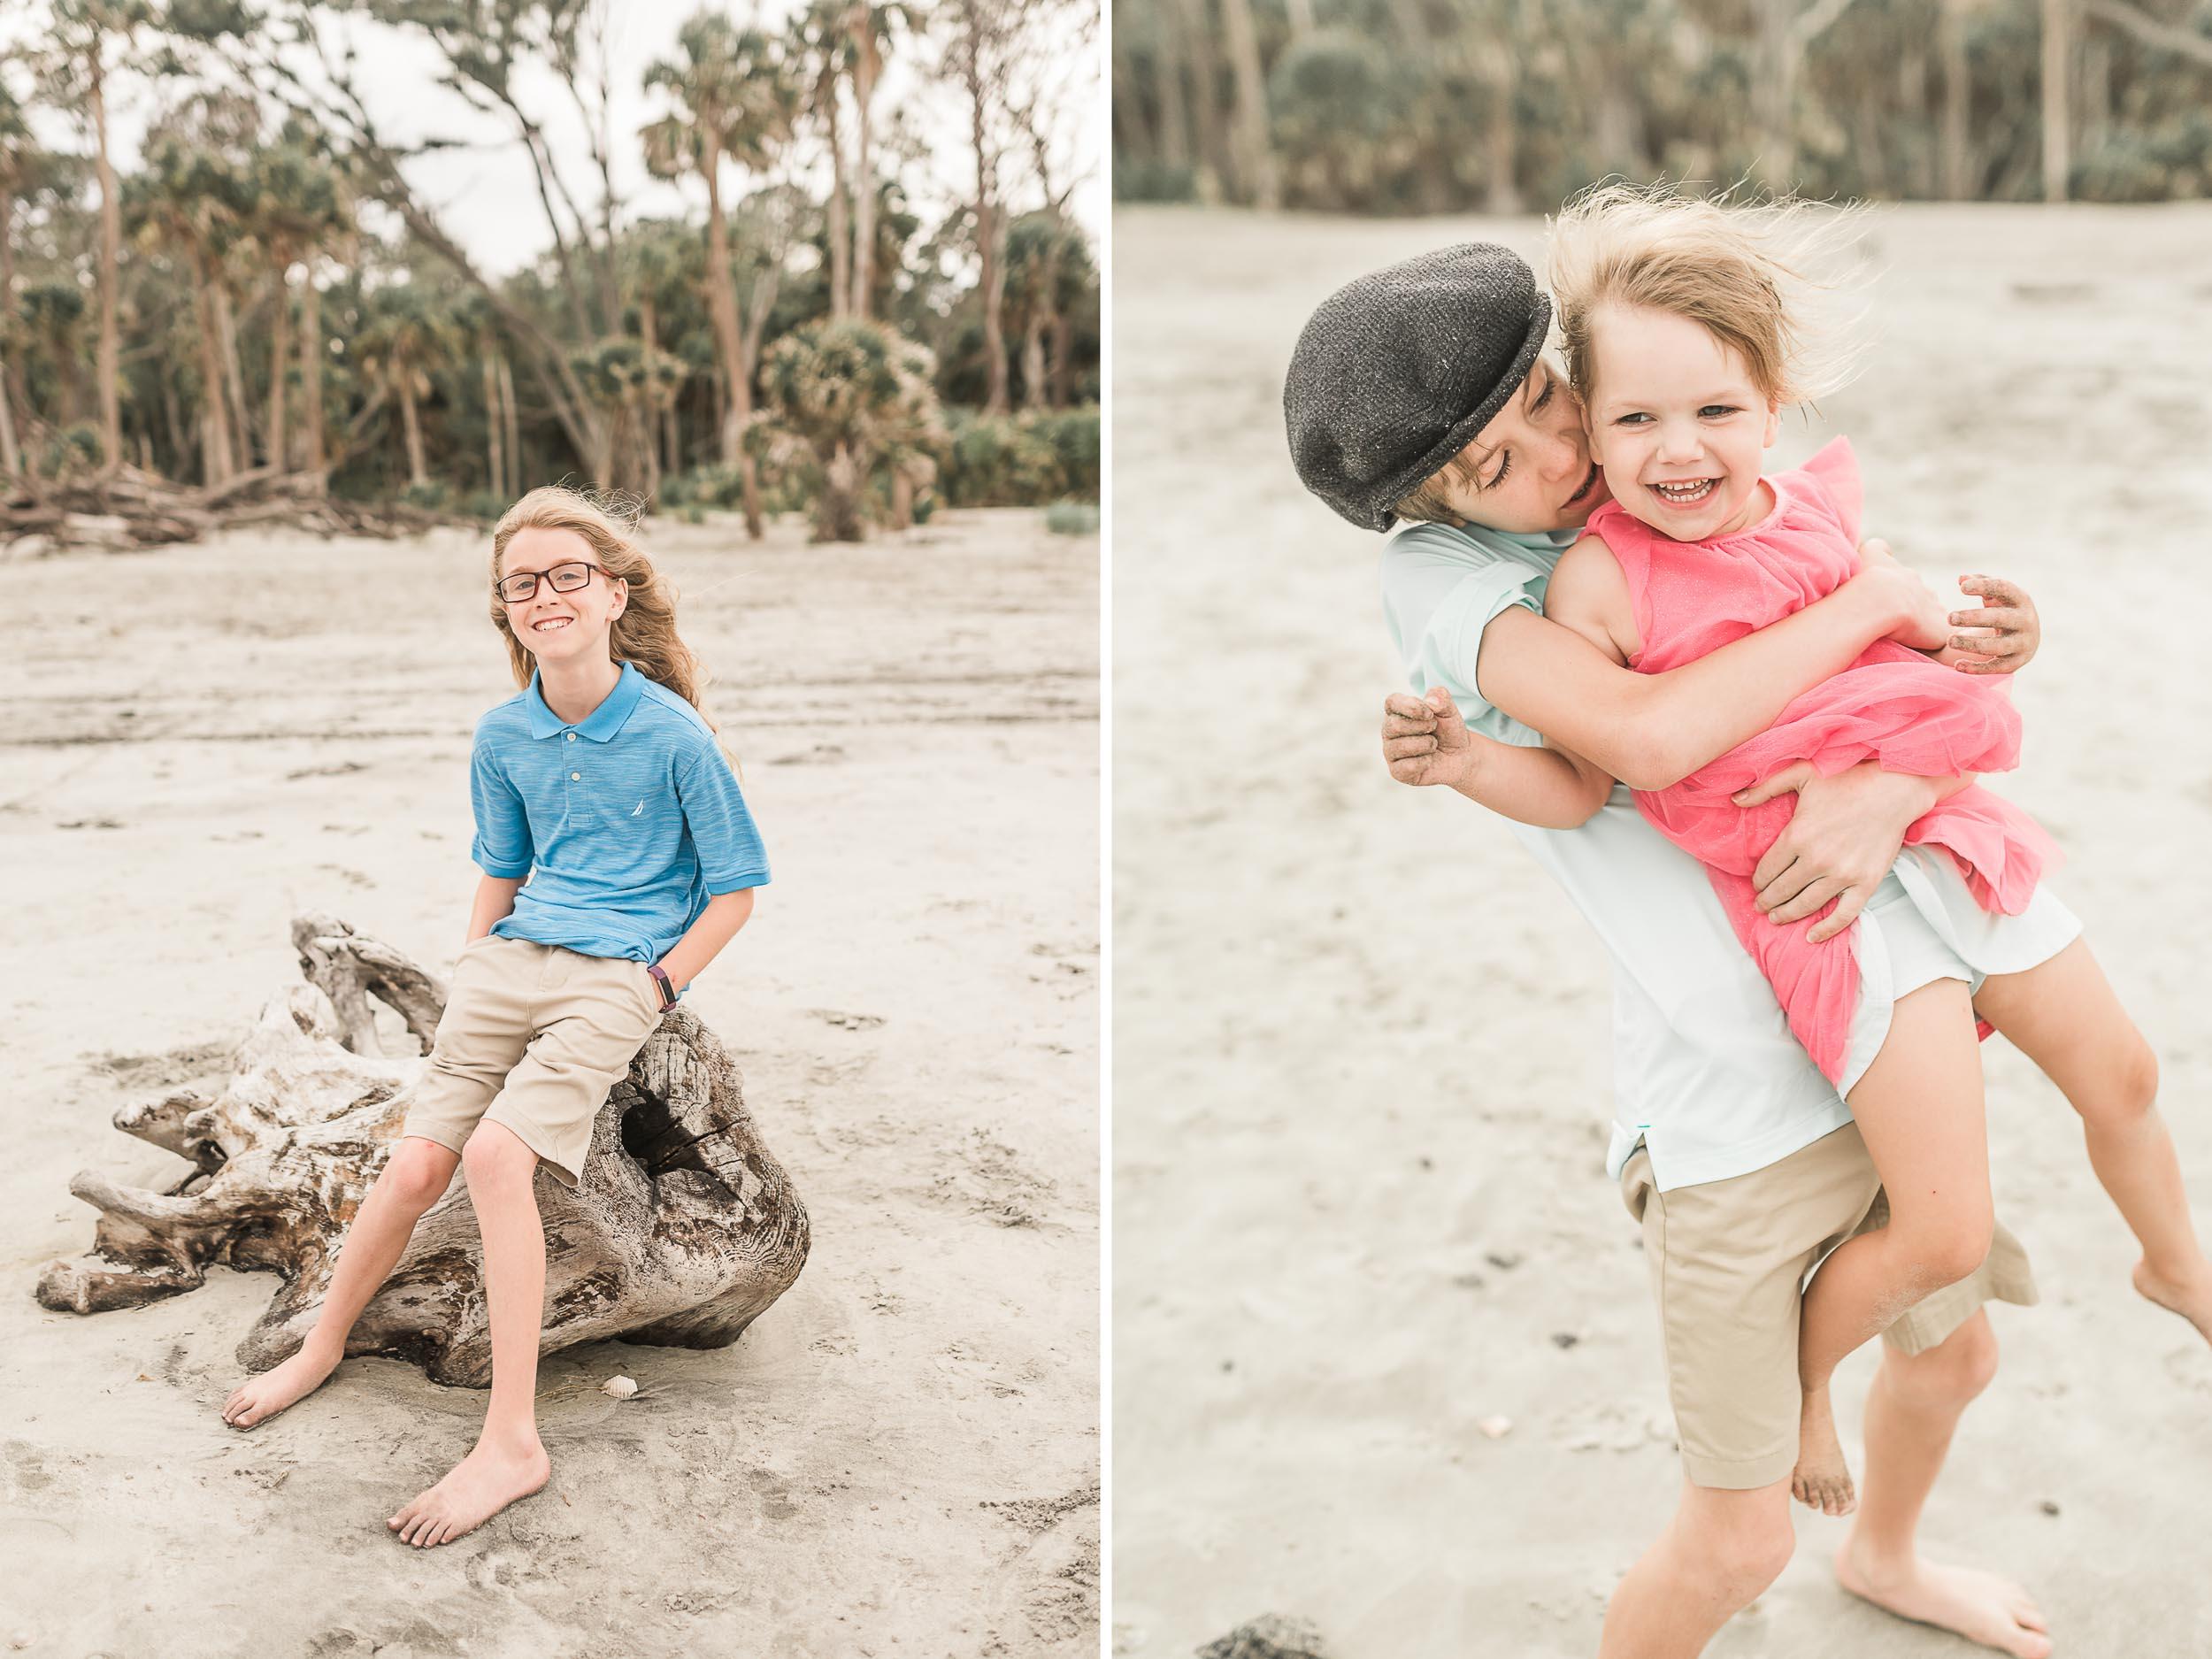 RachaelPearcePhotography_SCfamily photographer04-2.jpg